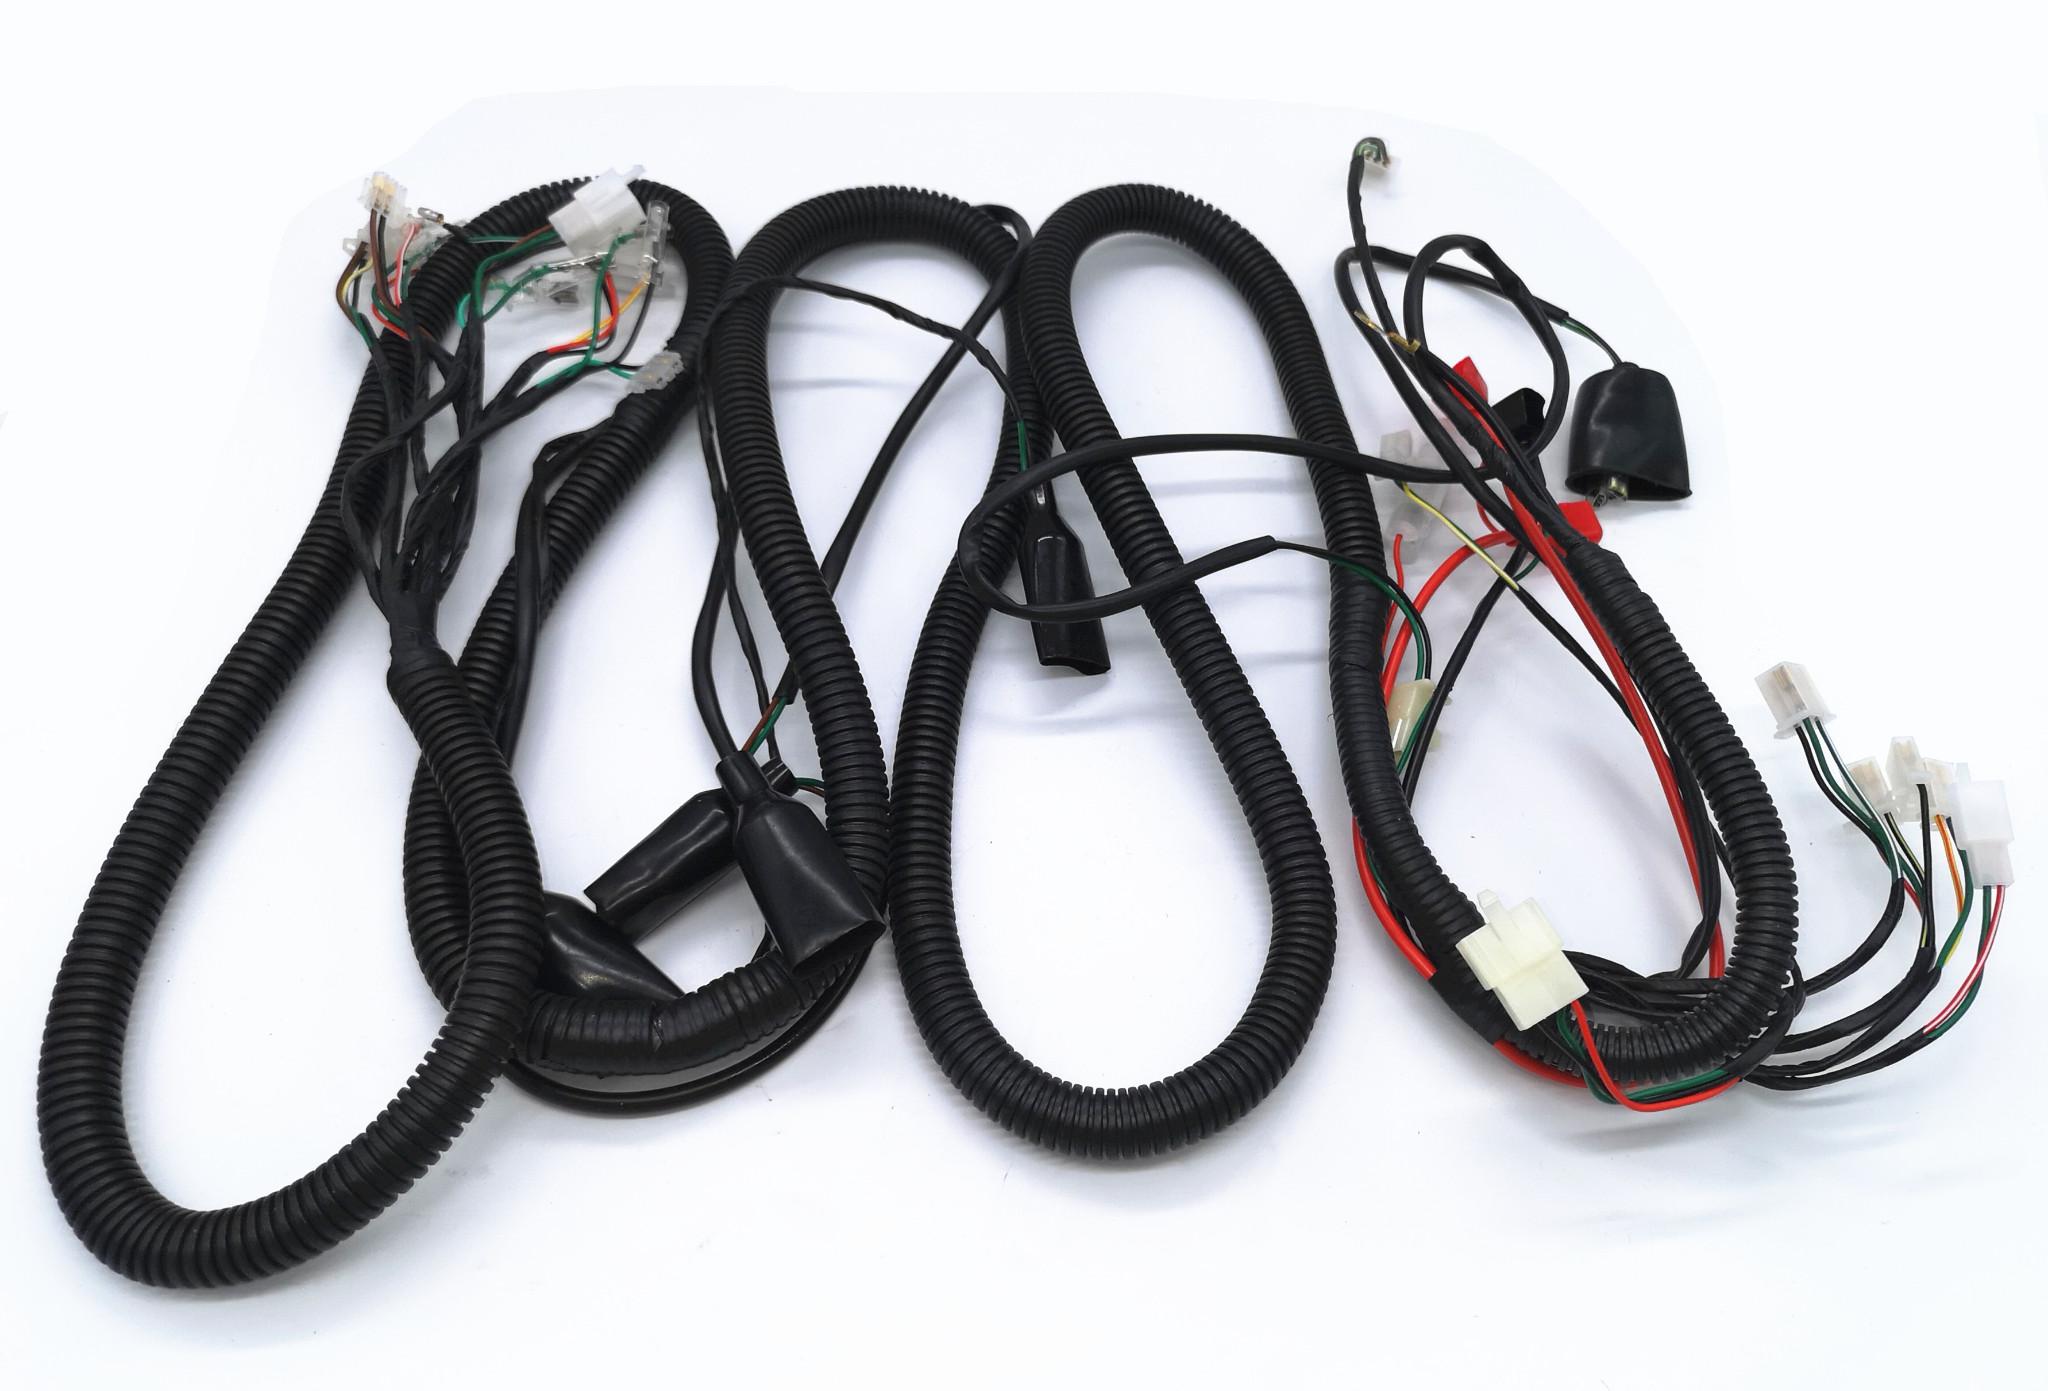 [DIAGRAM_5FD]  DZ_9400] Kinroad 250 Wiring Diagram Free Diagram | 250cc Gy6 Wiring Diagram |  | Hisre Odga Mohammedshrine Librar Wiring 101